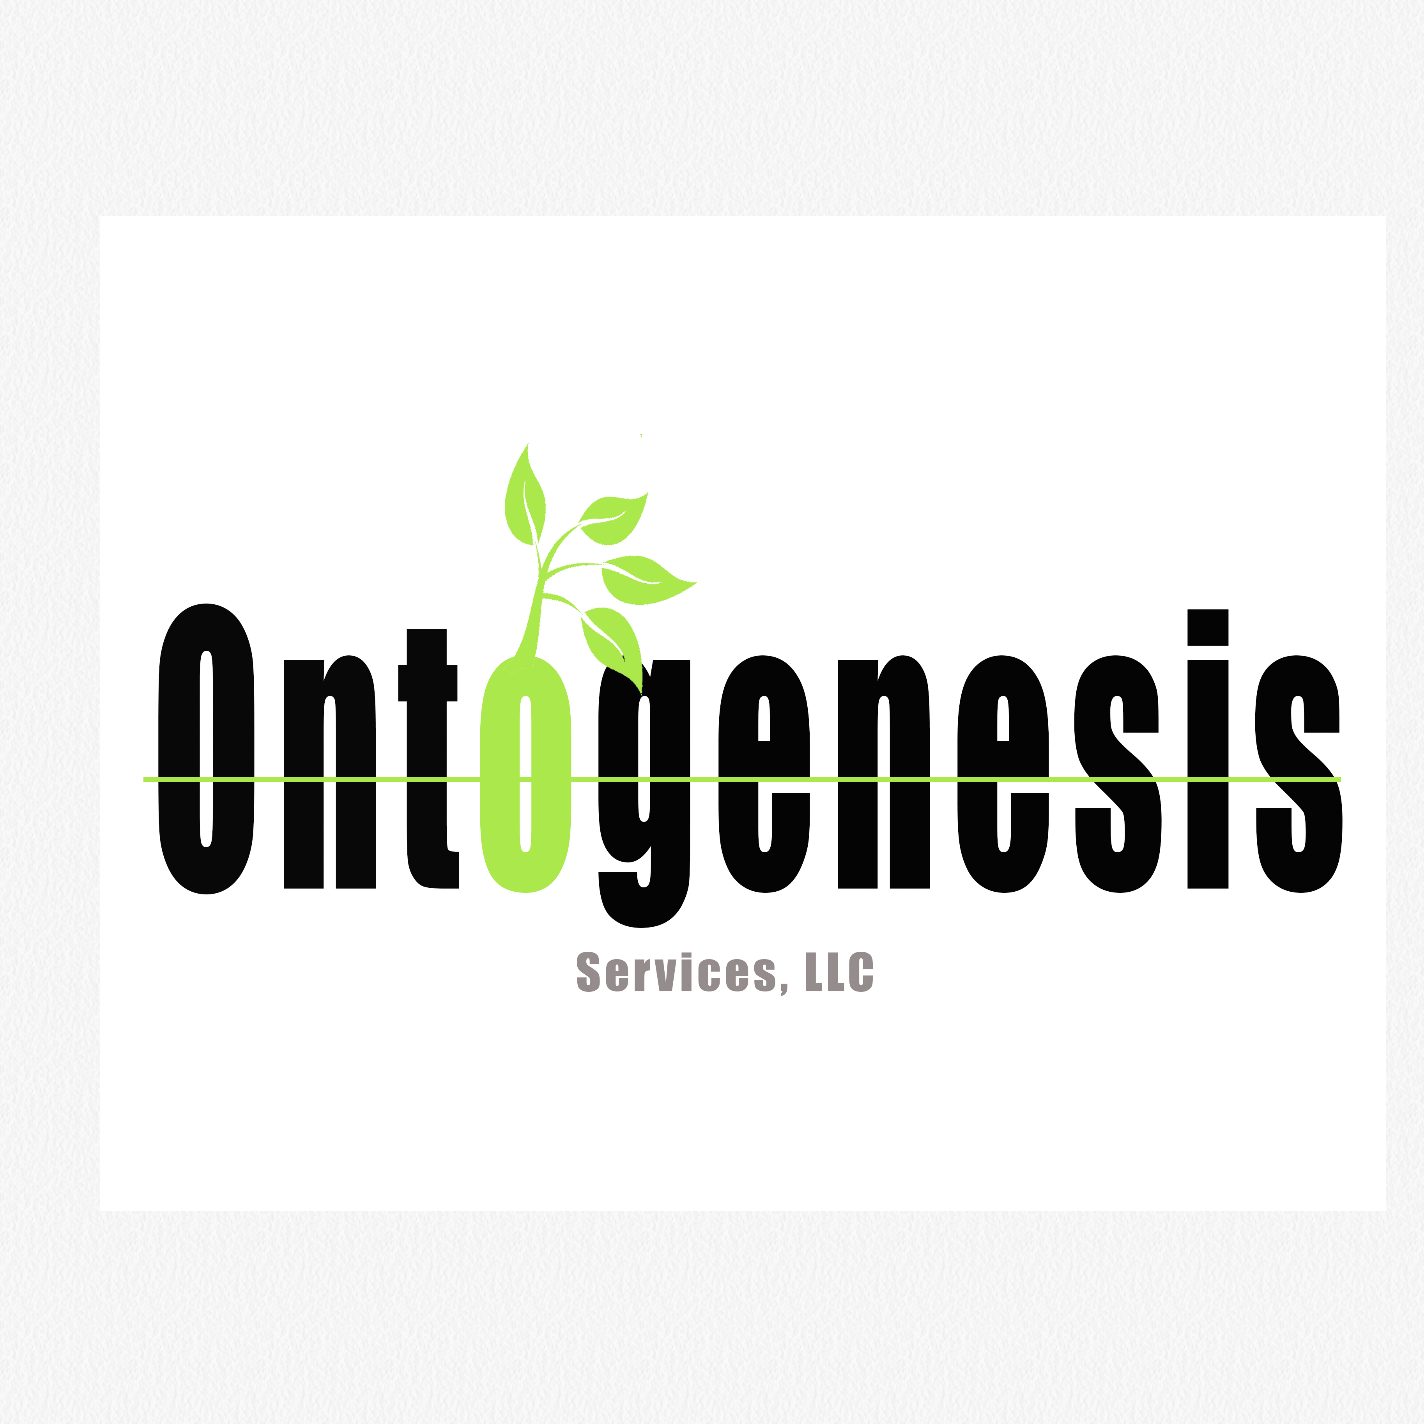 Ontogenesis Services llc